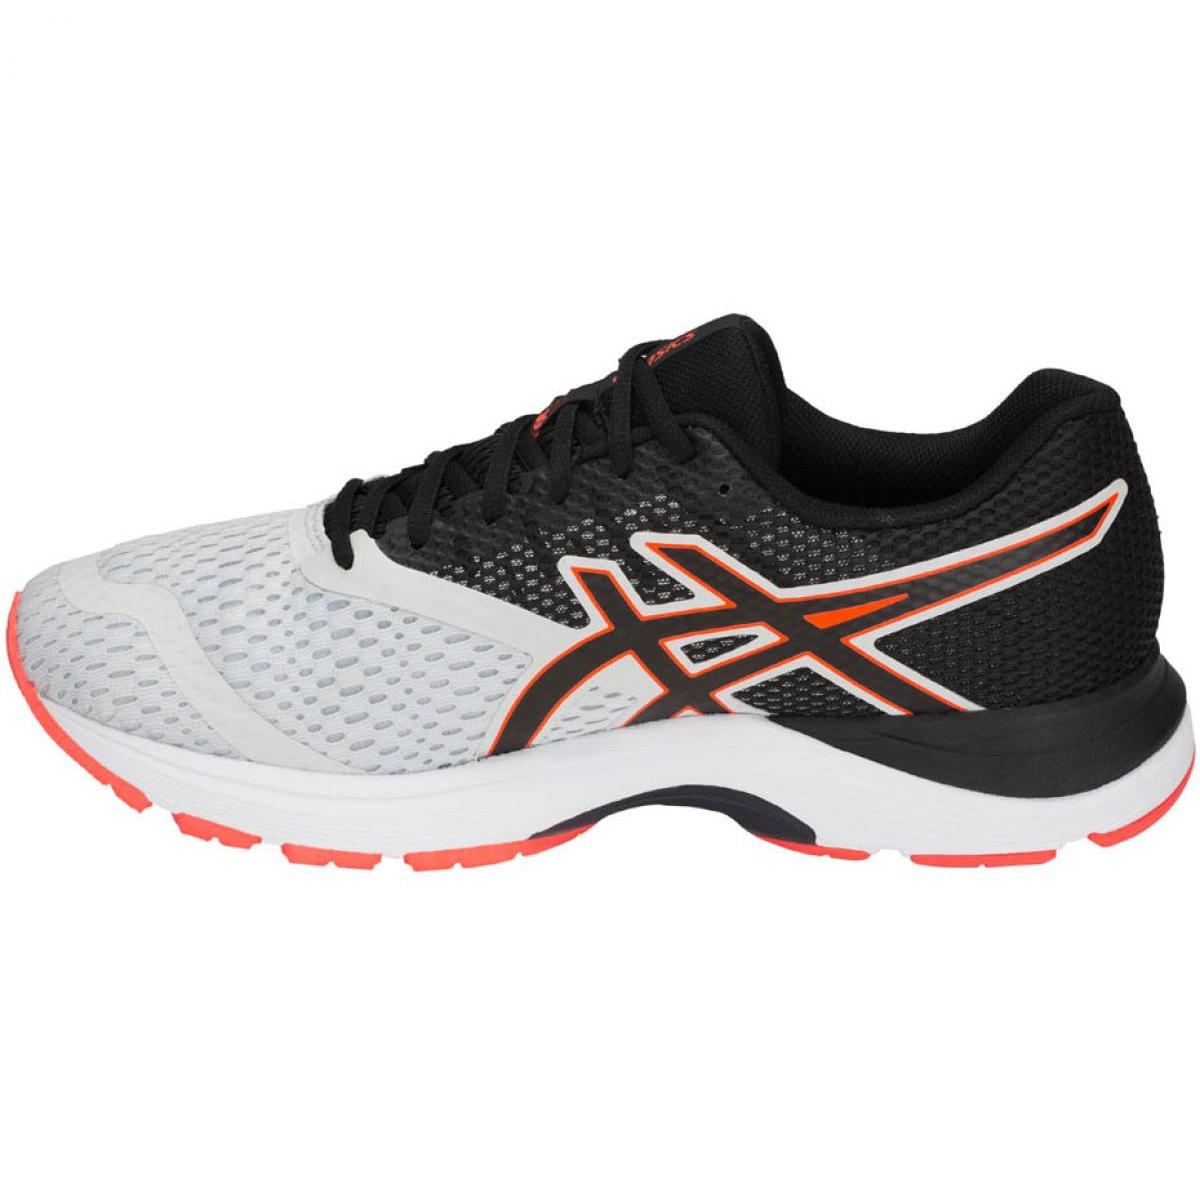 Zapatillas de correr Asics Gel Pulse 10 M 1011A007 020